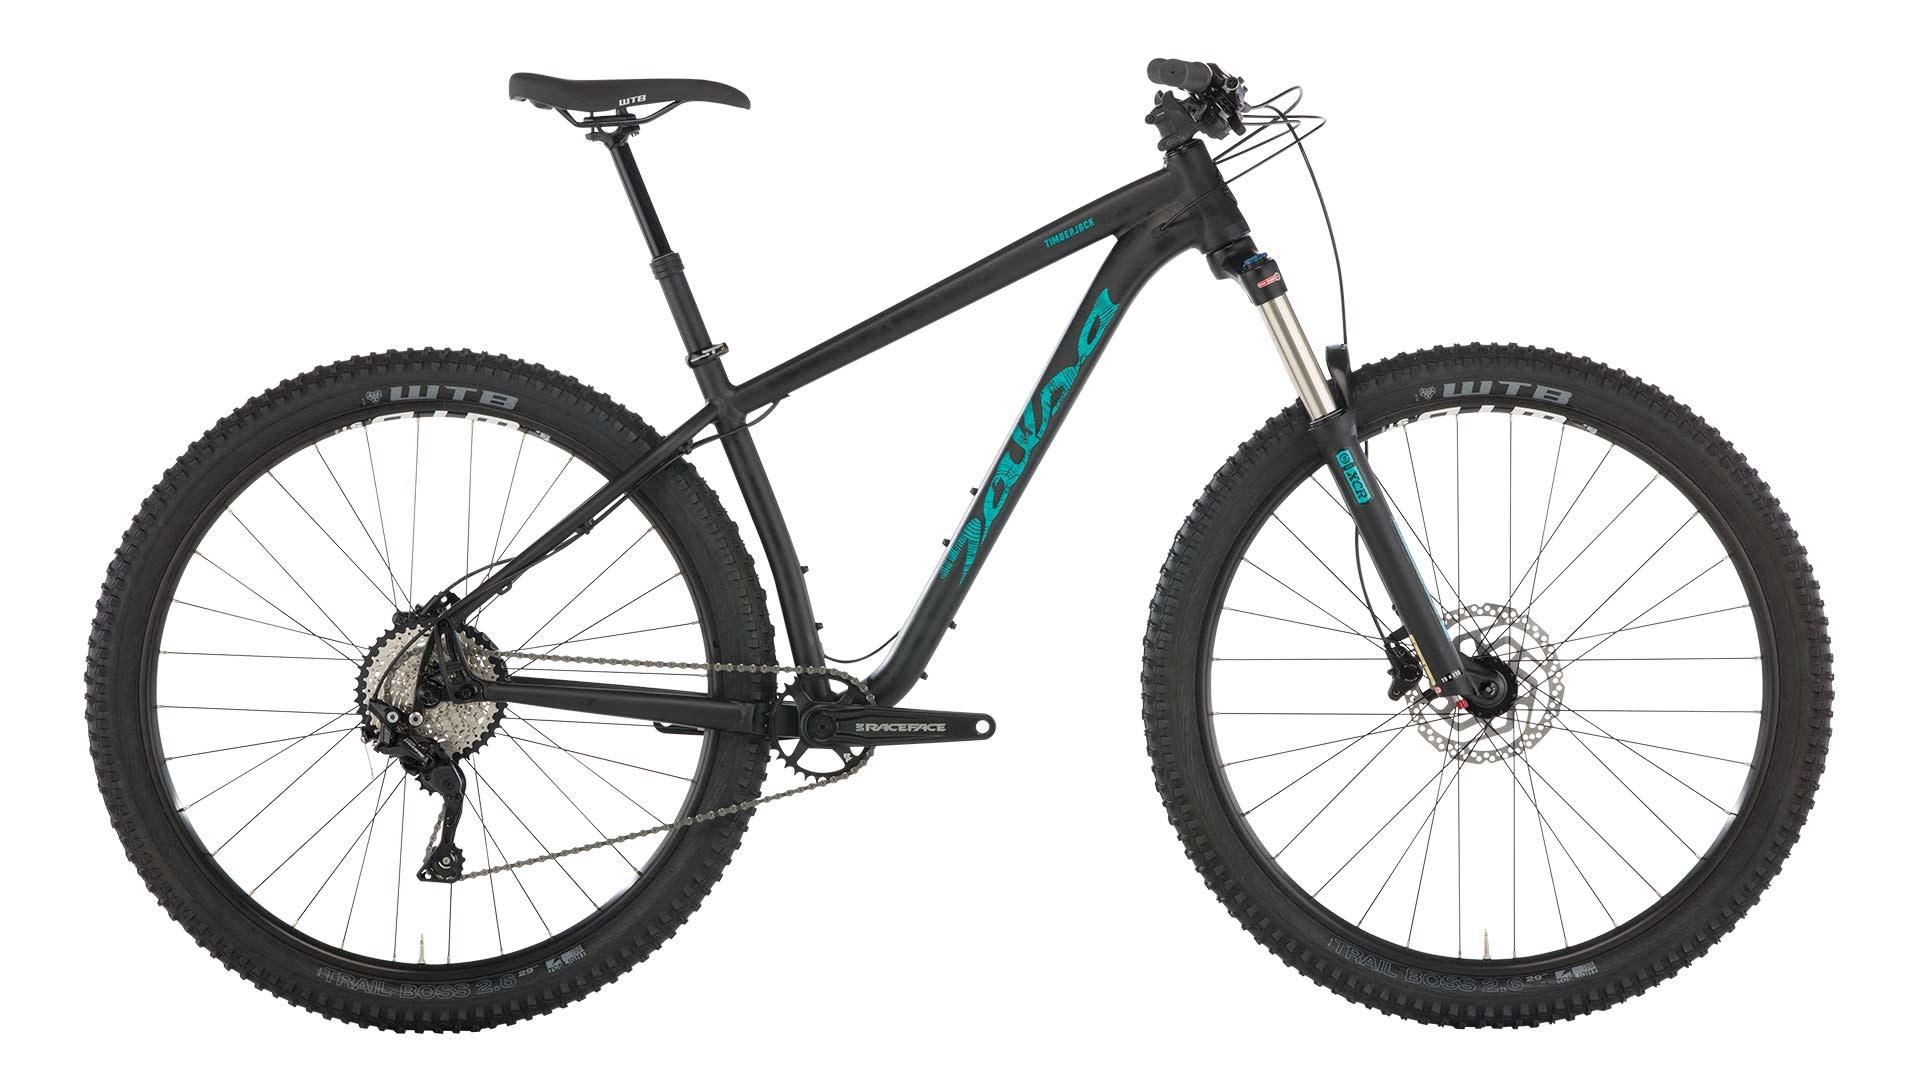 Salsa Salsa Timberjack Deore 29 Bike Black 2019